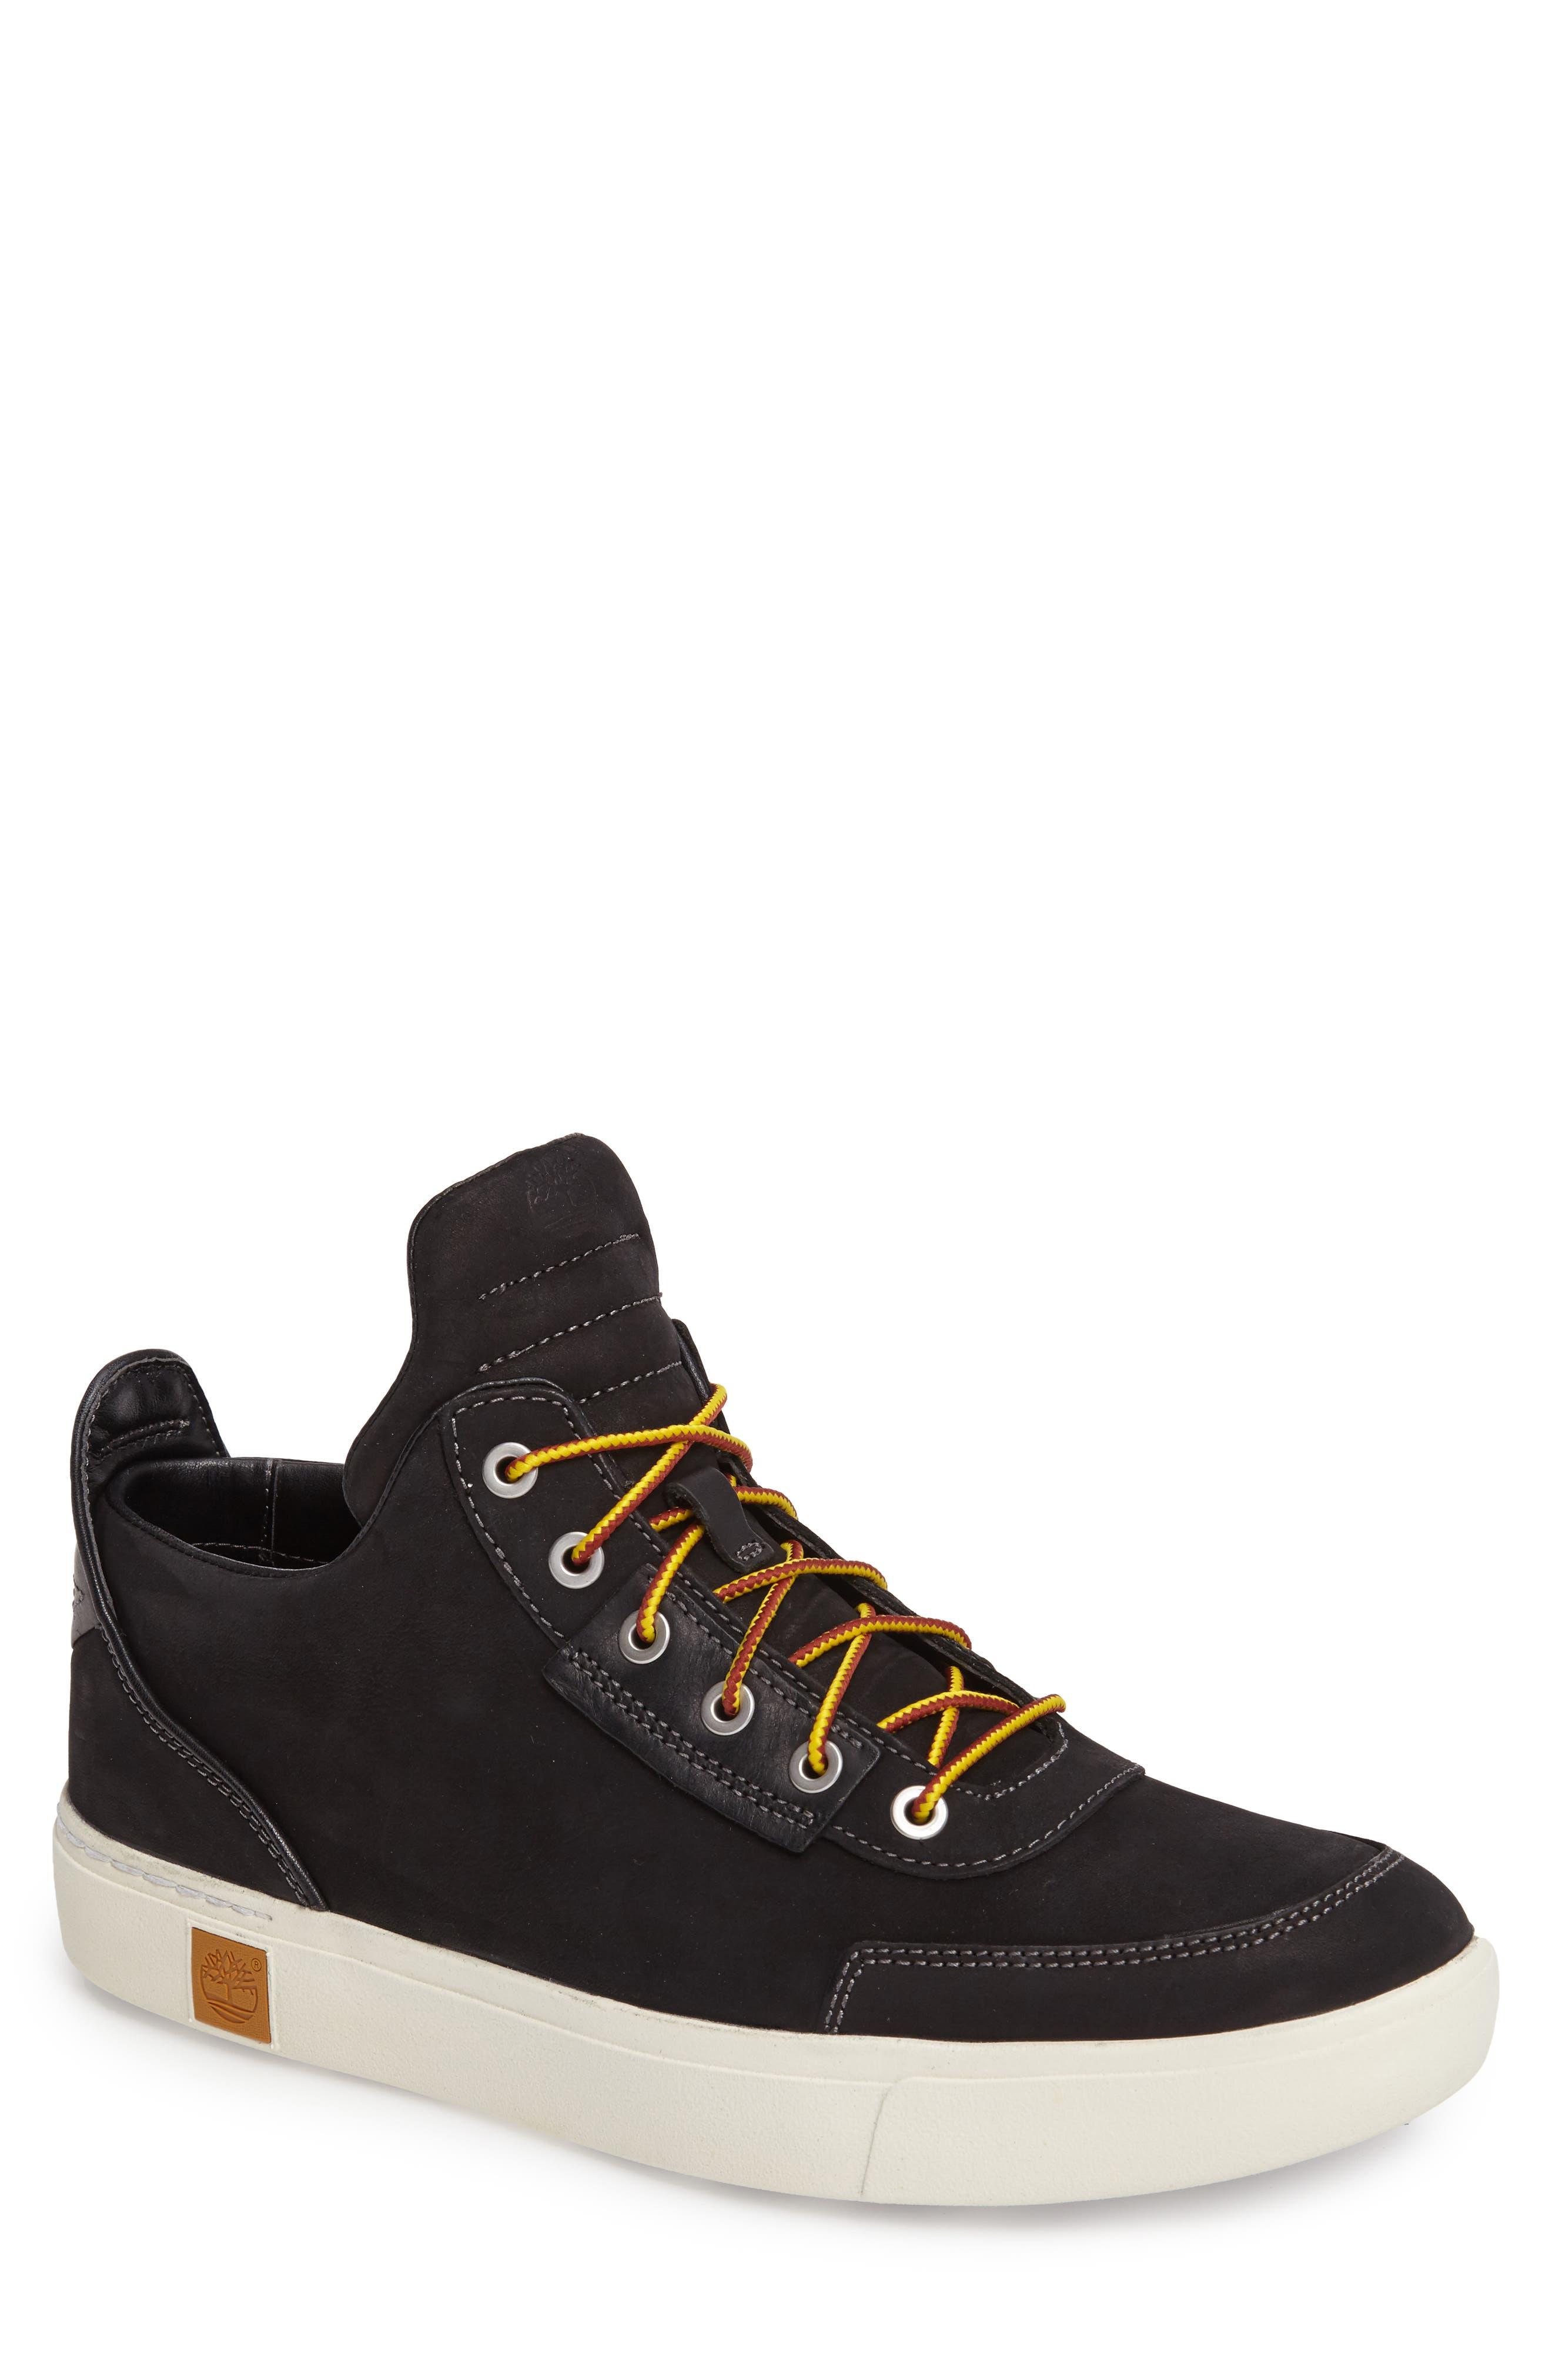 Amherst Chukka Sneaker,                             Main thumbnail 1, color,                             001